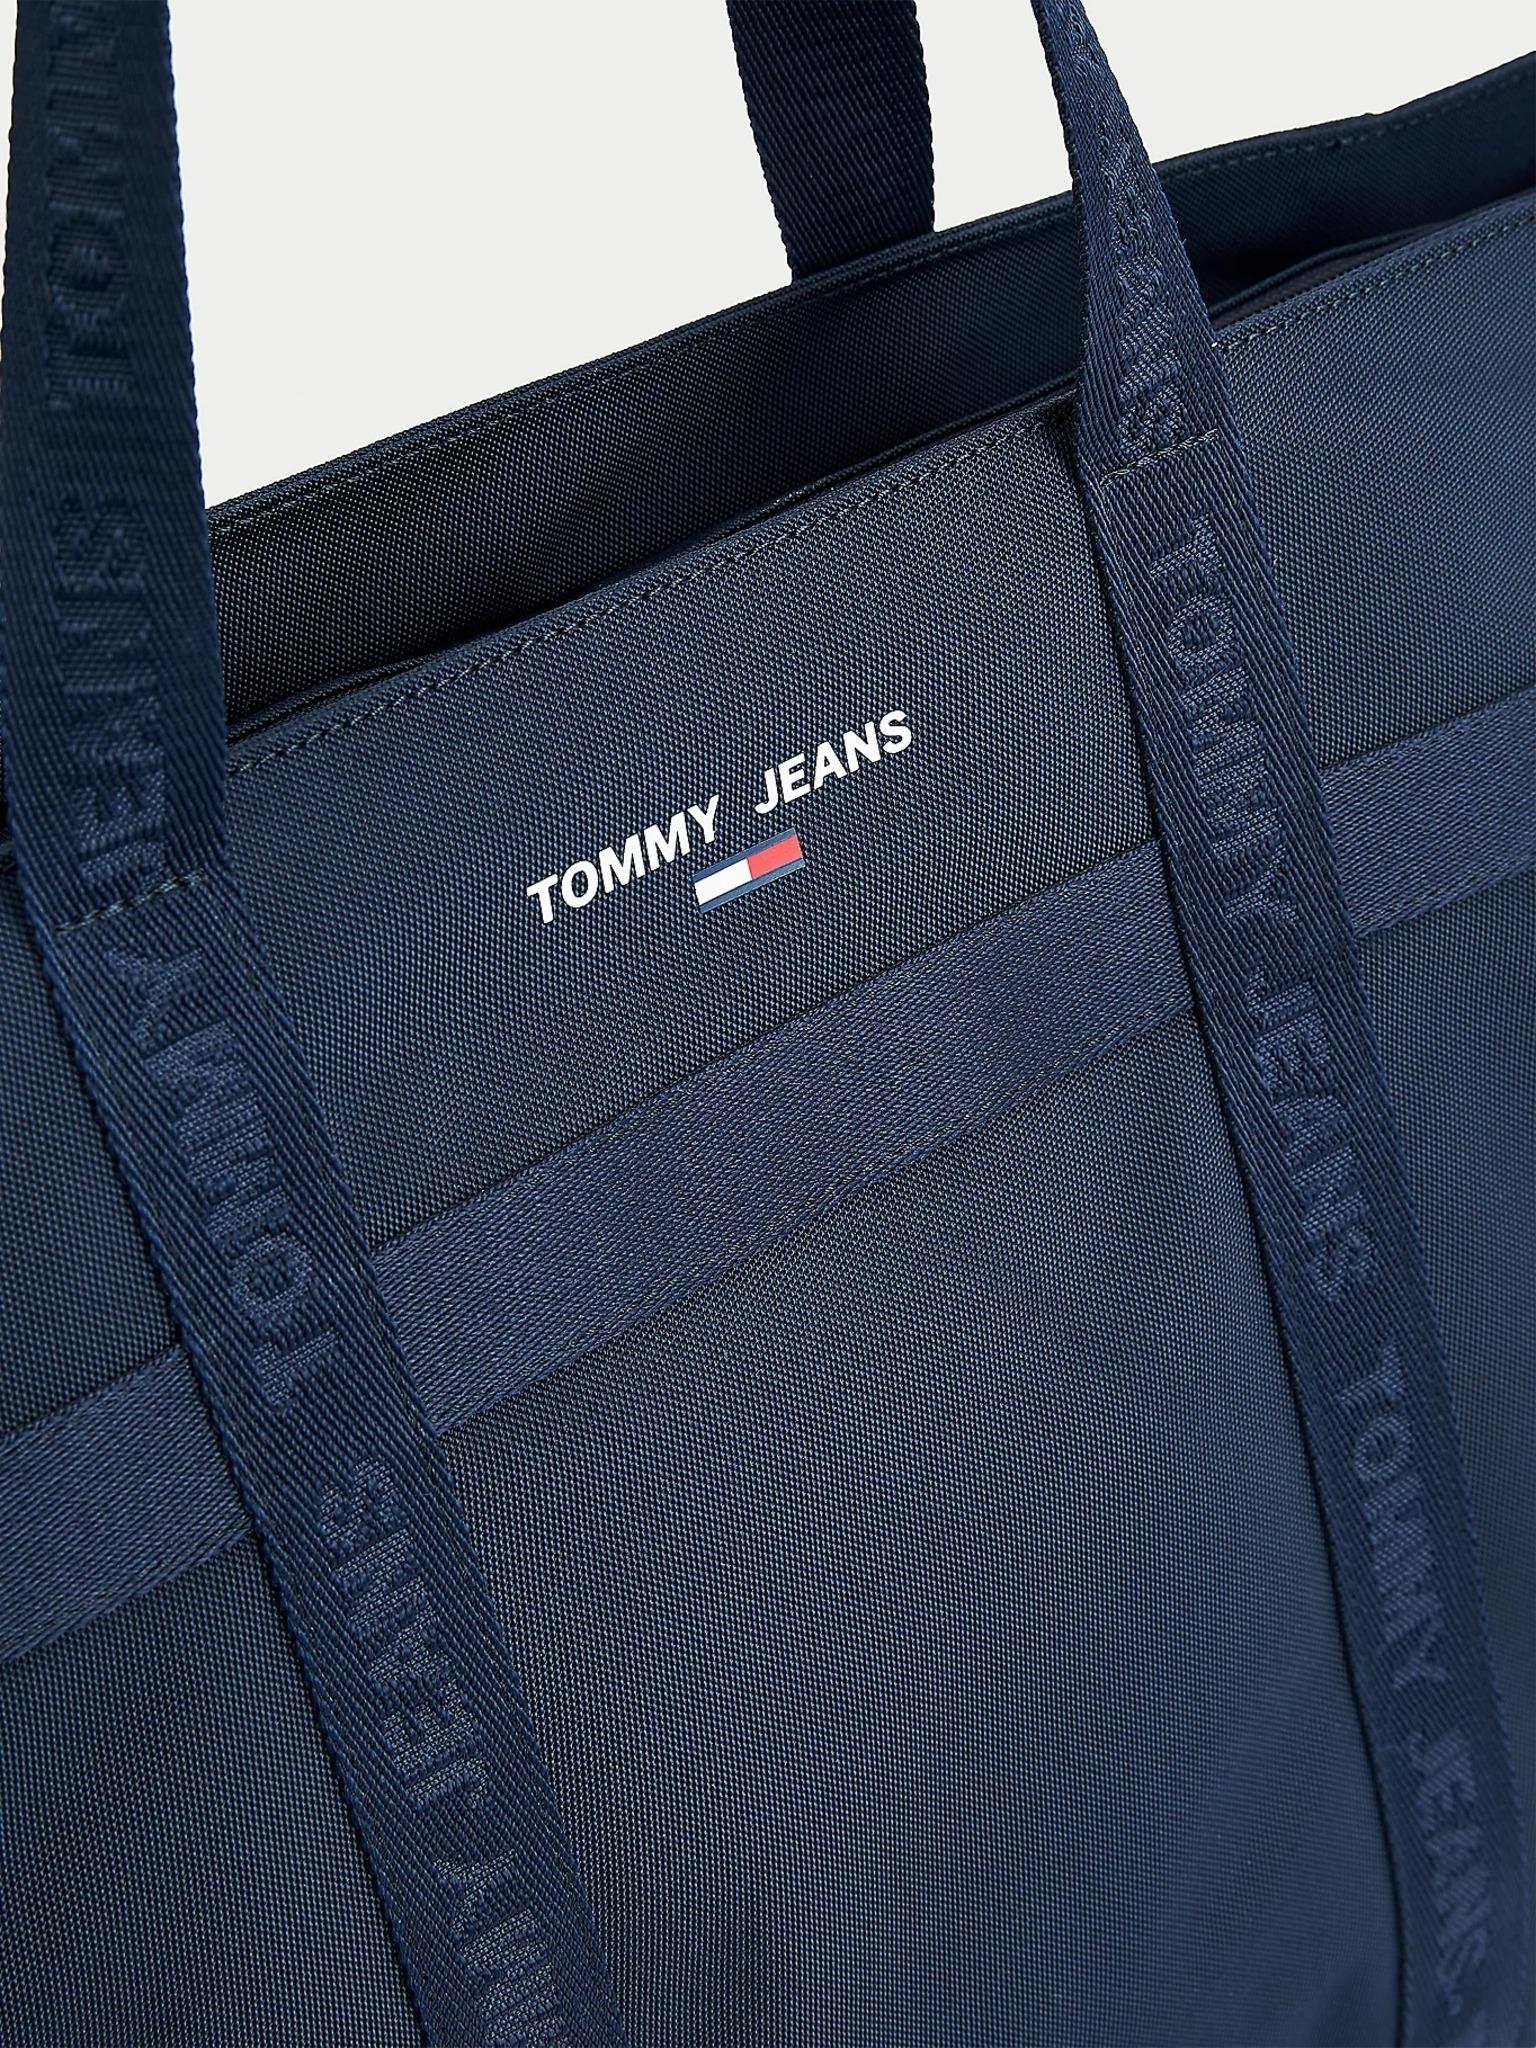 Tommy Jeans Borsetta donna blu Kabelka